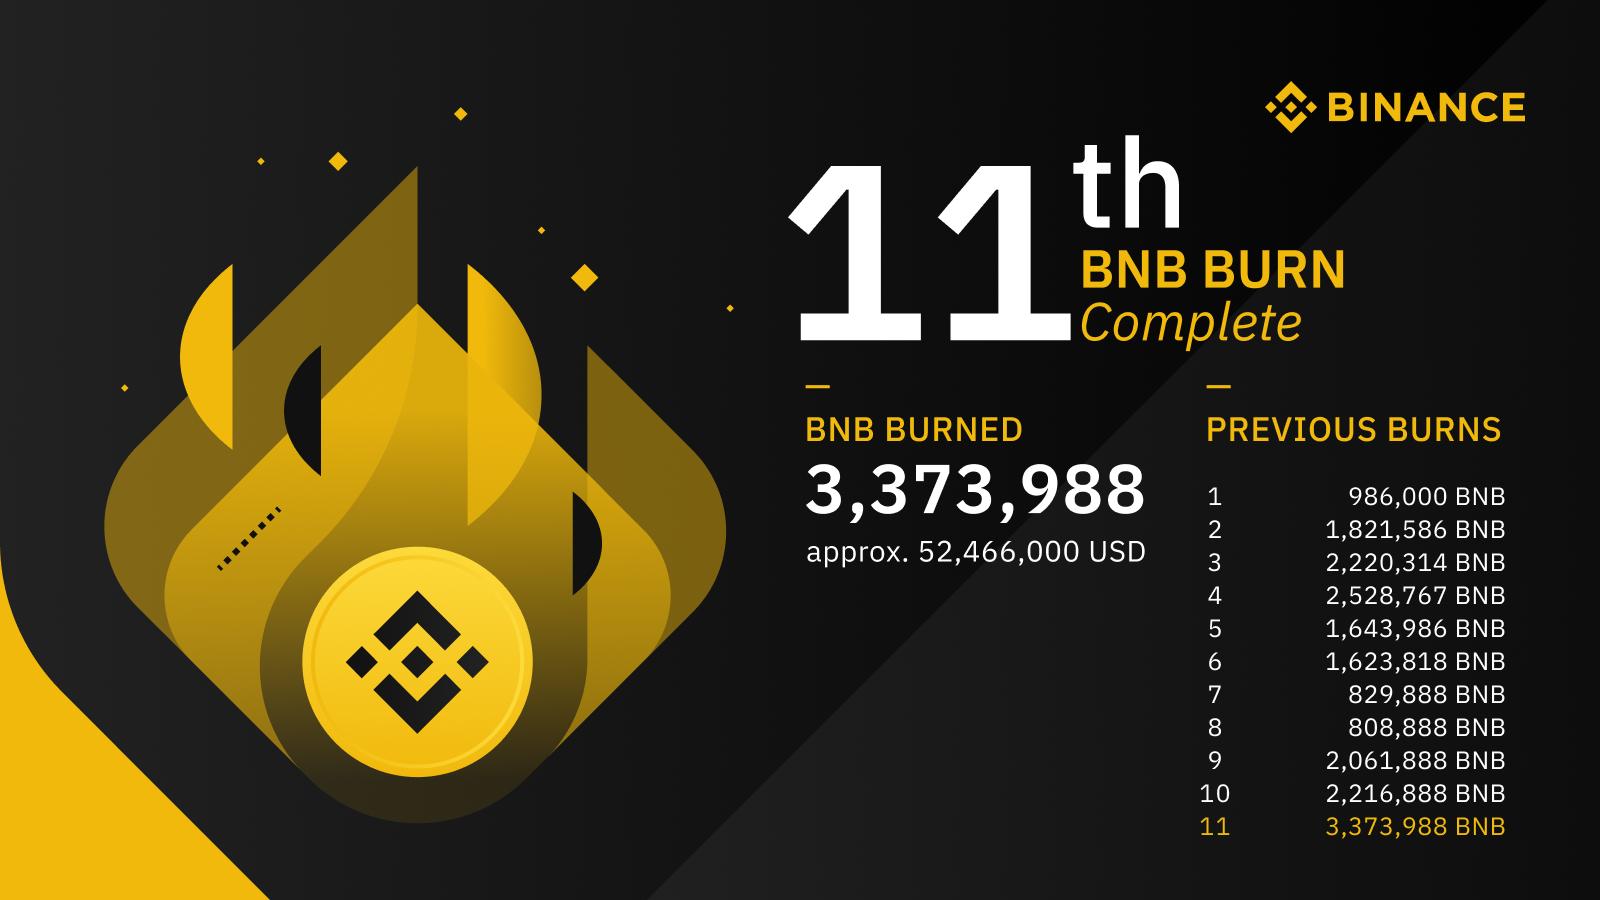 BNB 11 quarterly burns graphic